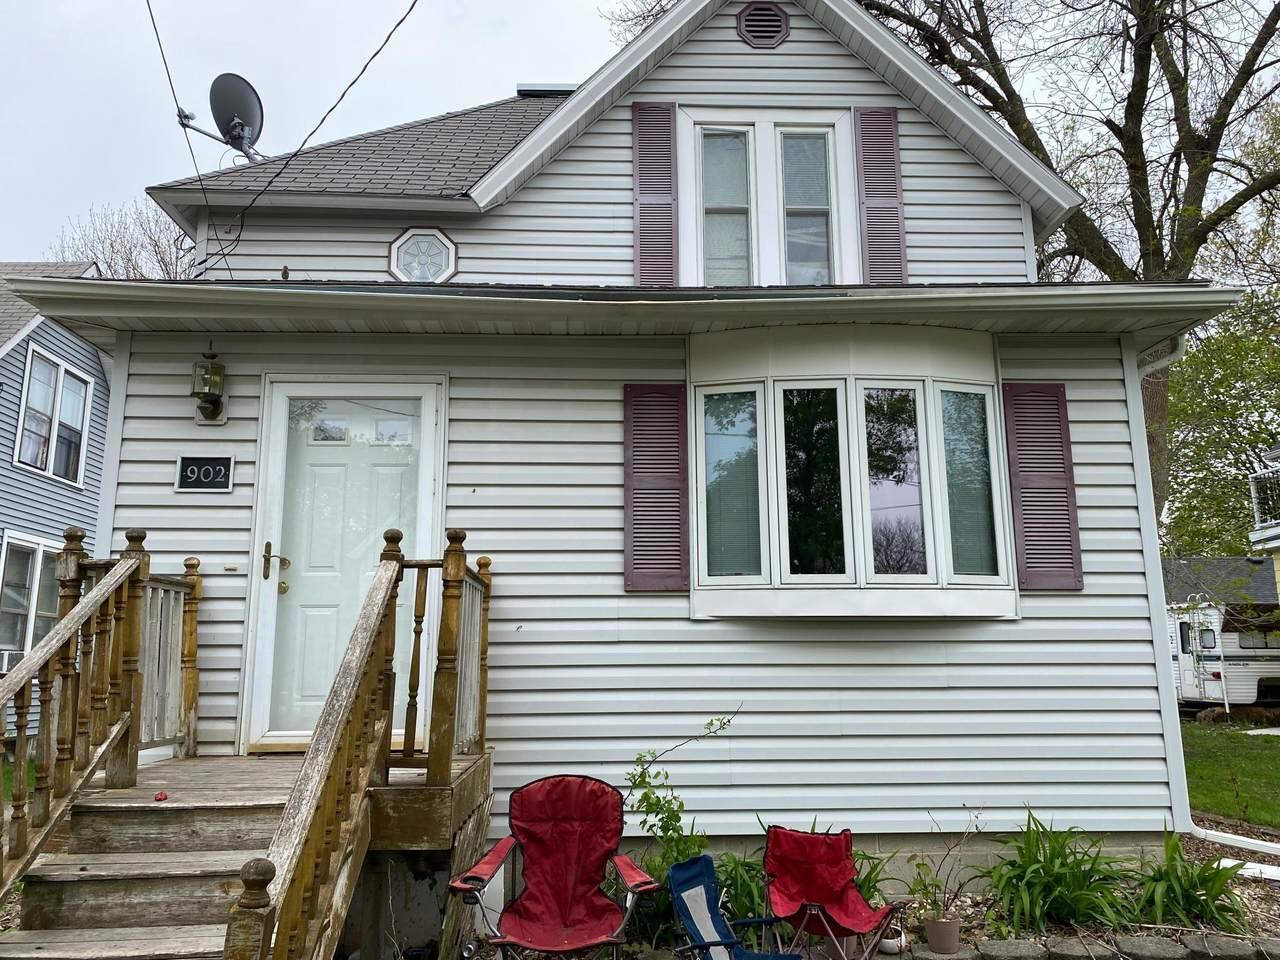 902 Frank Avenue - Photo 1